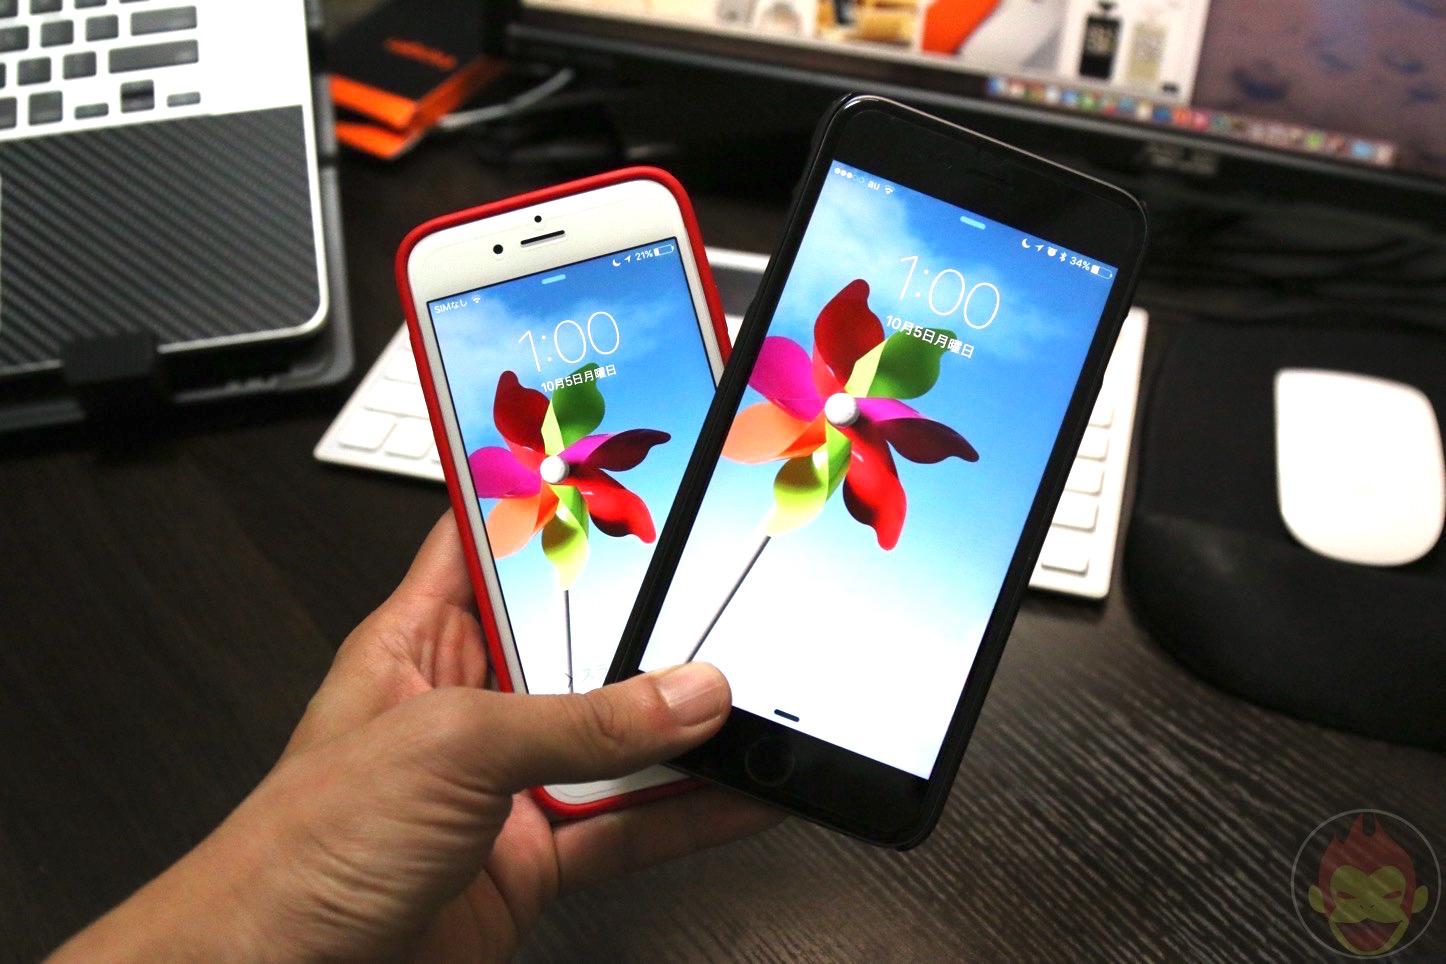 iPhone6s-6splus-Comparison-hero-50.JPG